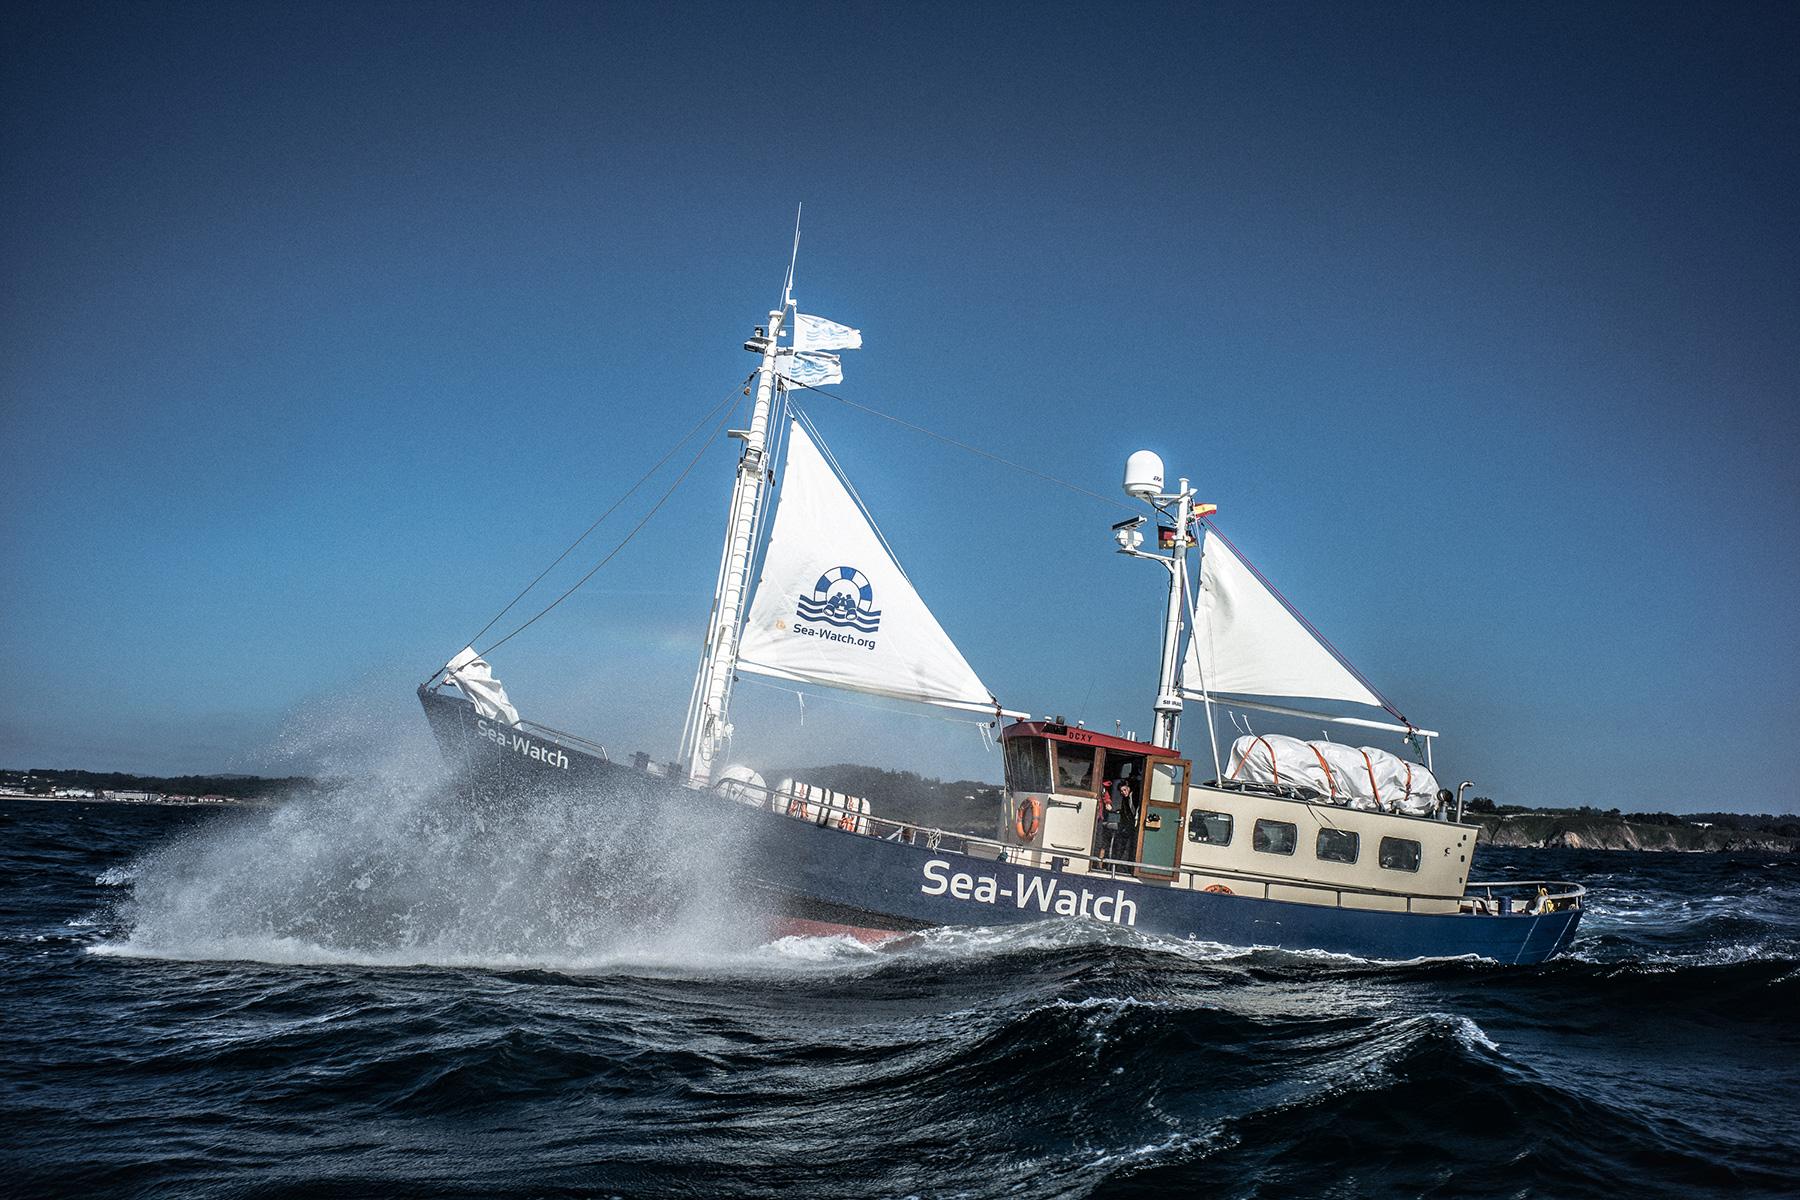 sea watch - photo #16